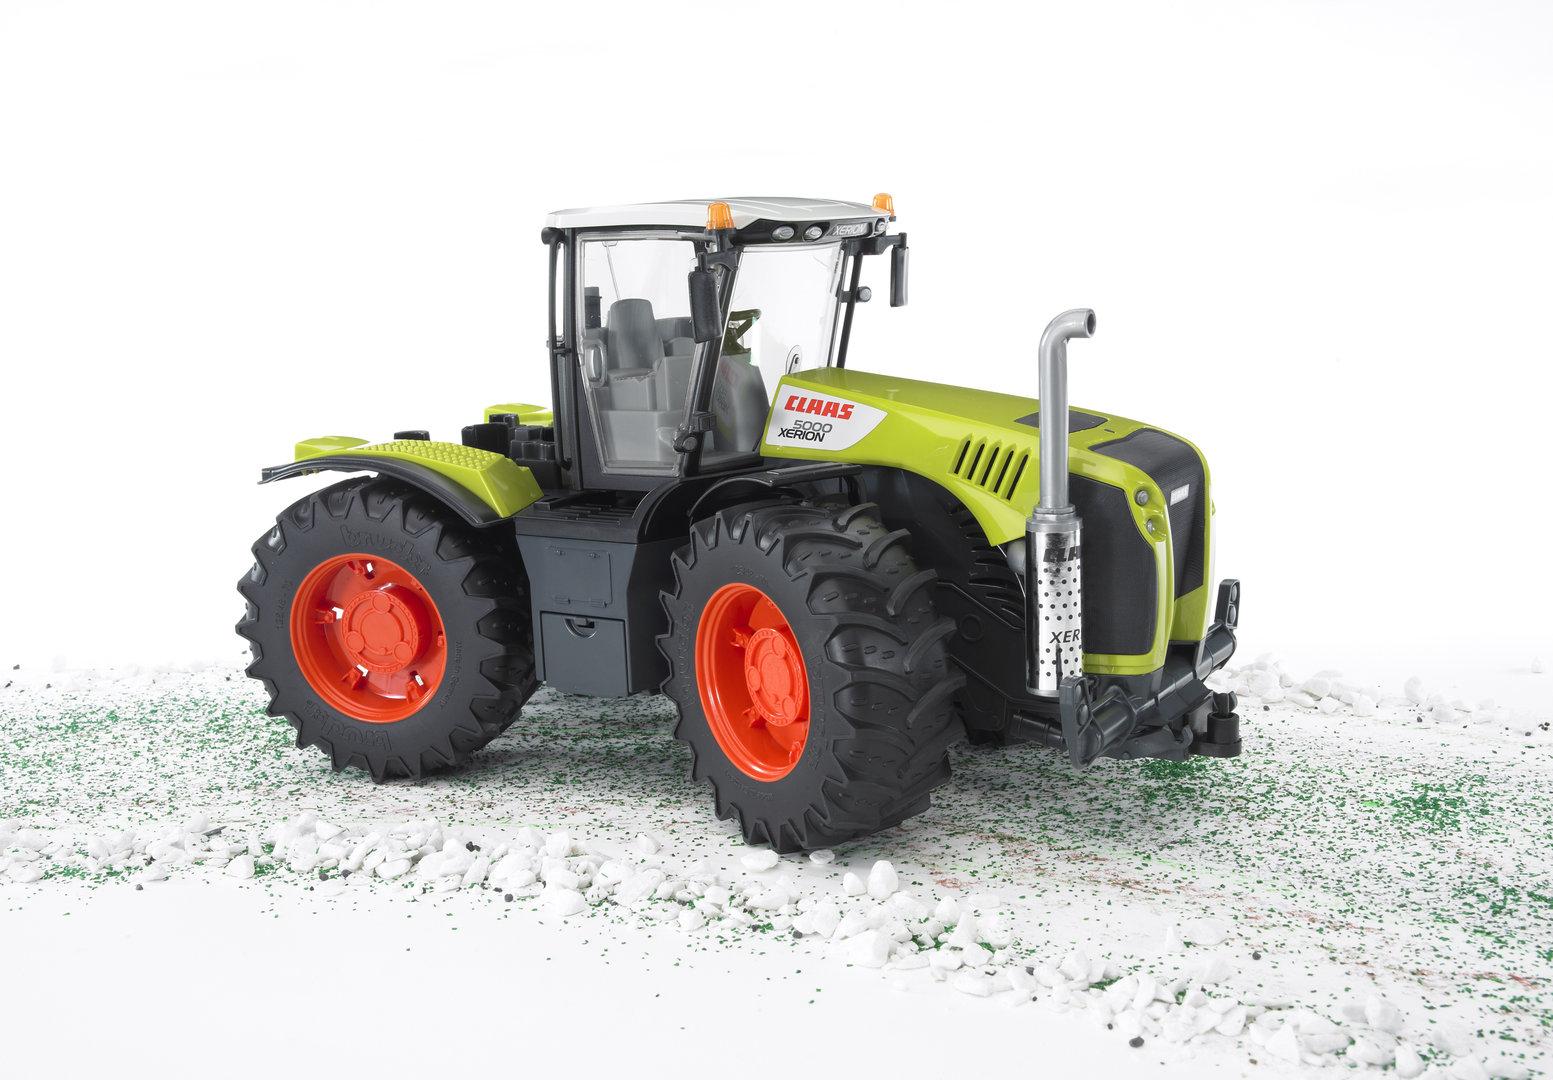 claas xerion 5000 - bruder traktoren, bruder claas, bruder